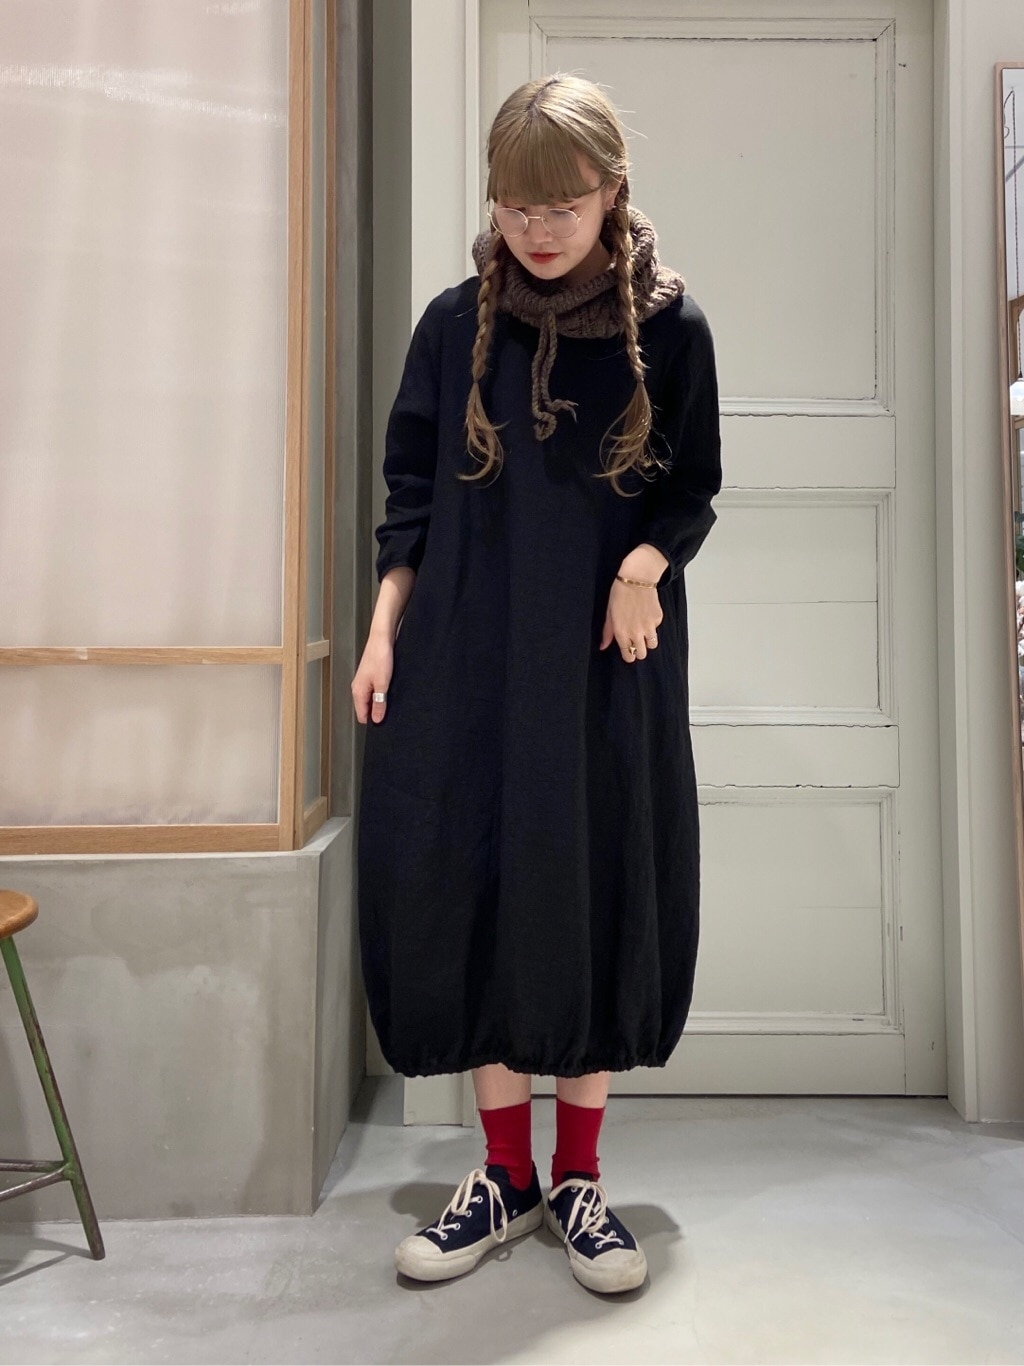 bulle de savon 渋谷スクランブルスクエア 身長:160cm 2020.10.08